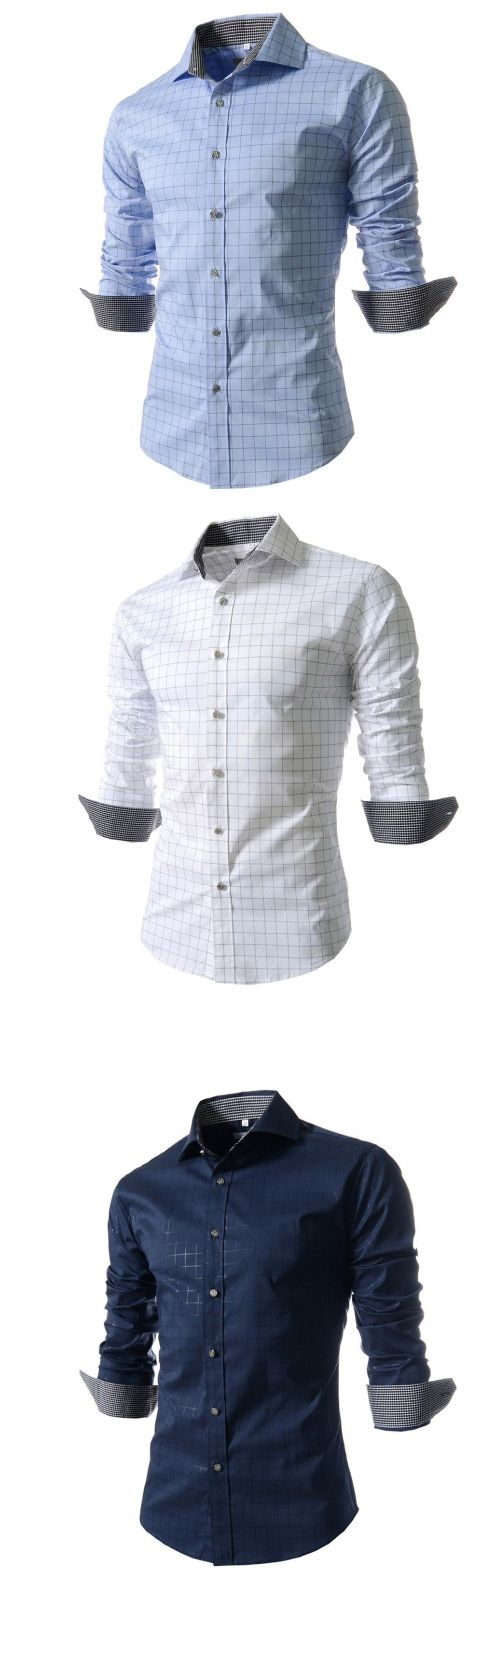 Men's Work/Formal Check Print Long Sleeve Shirt